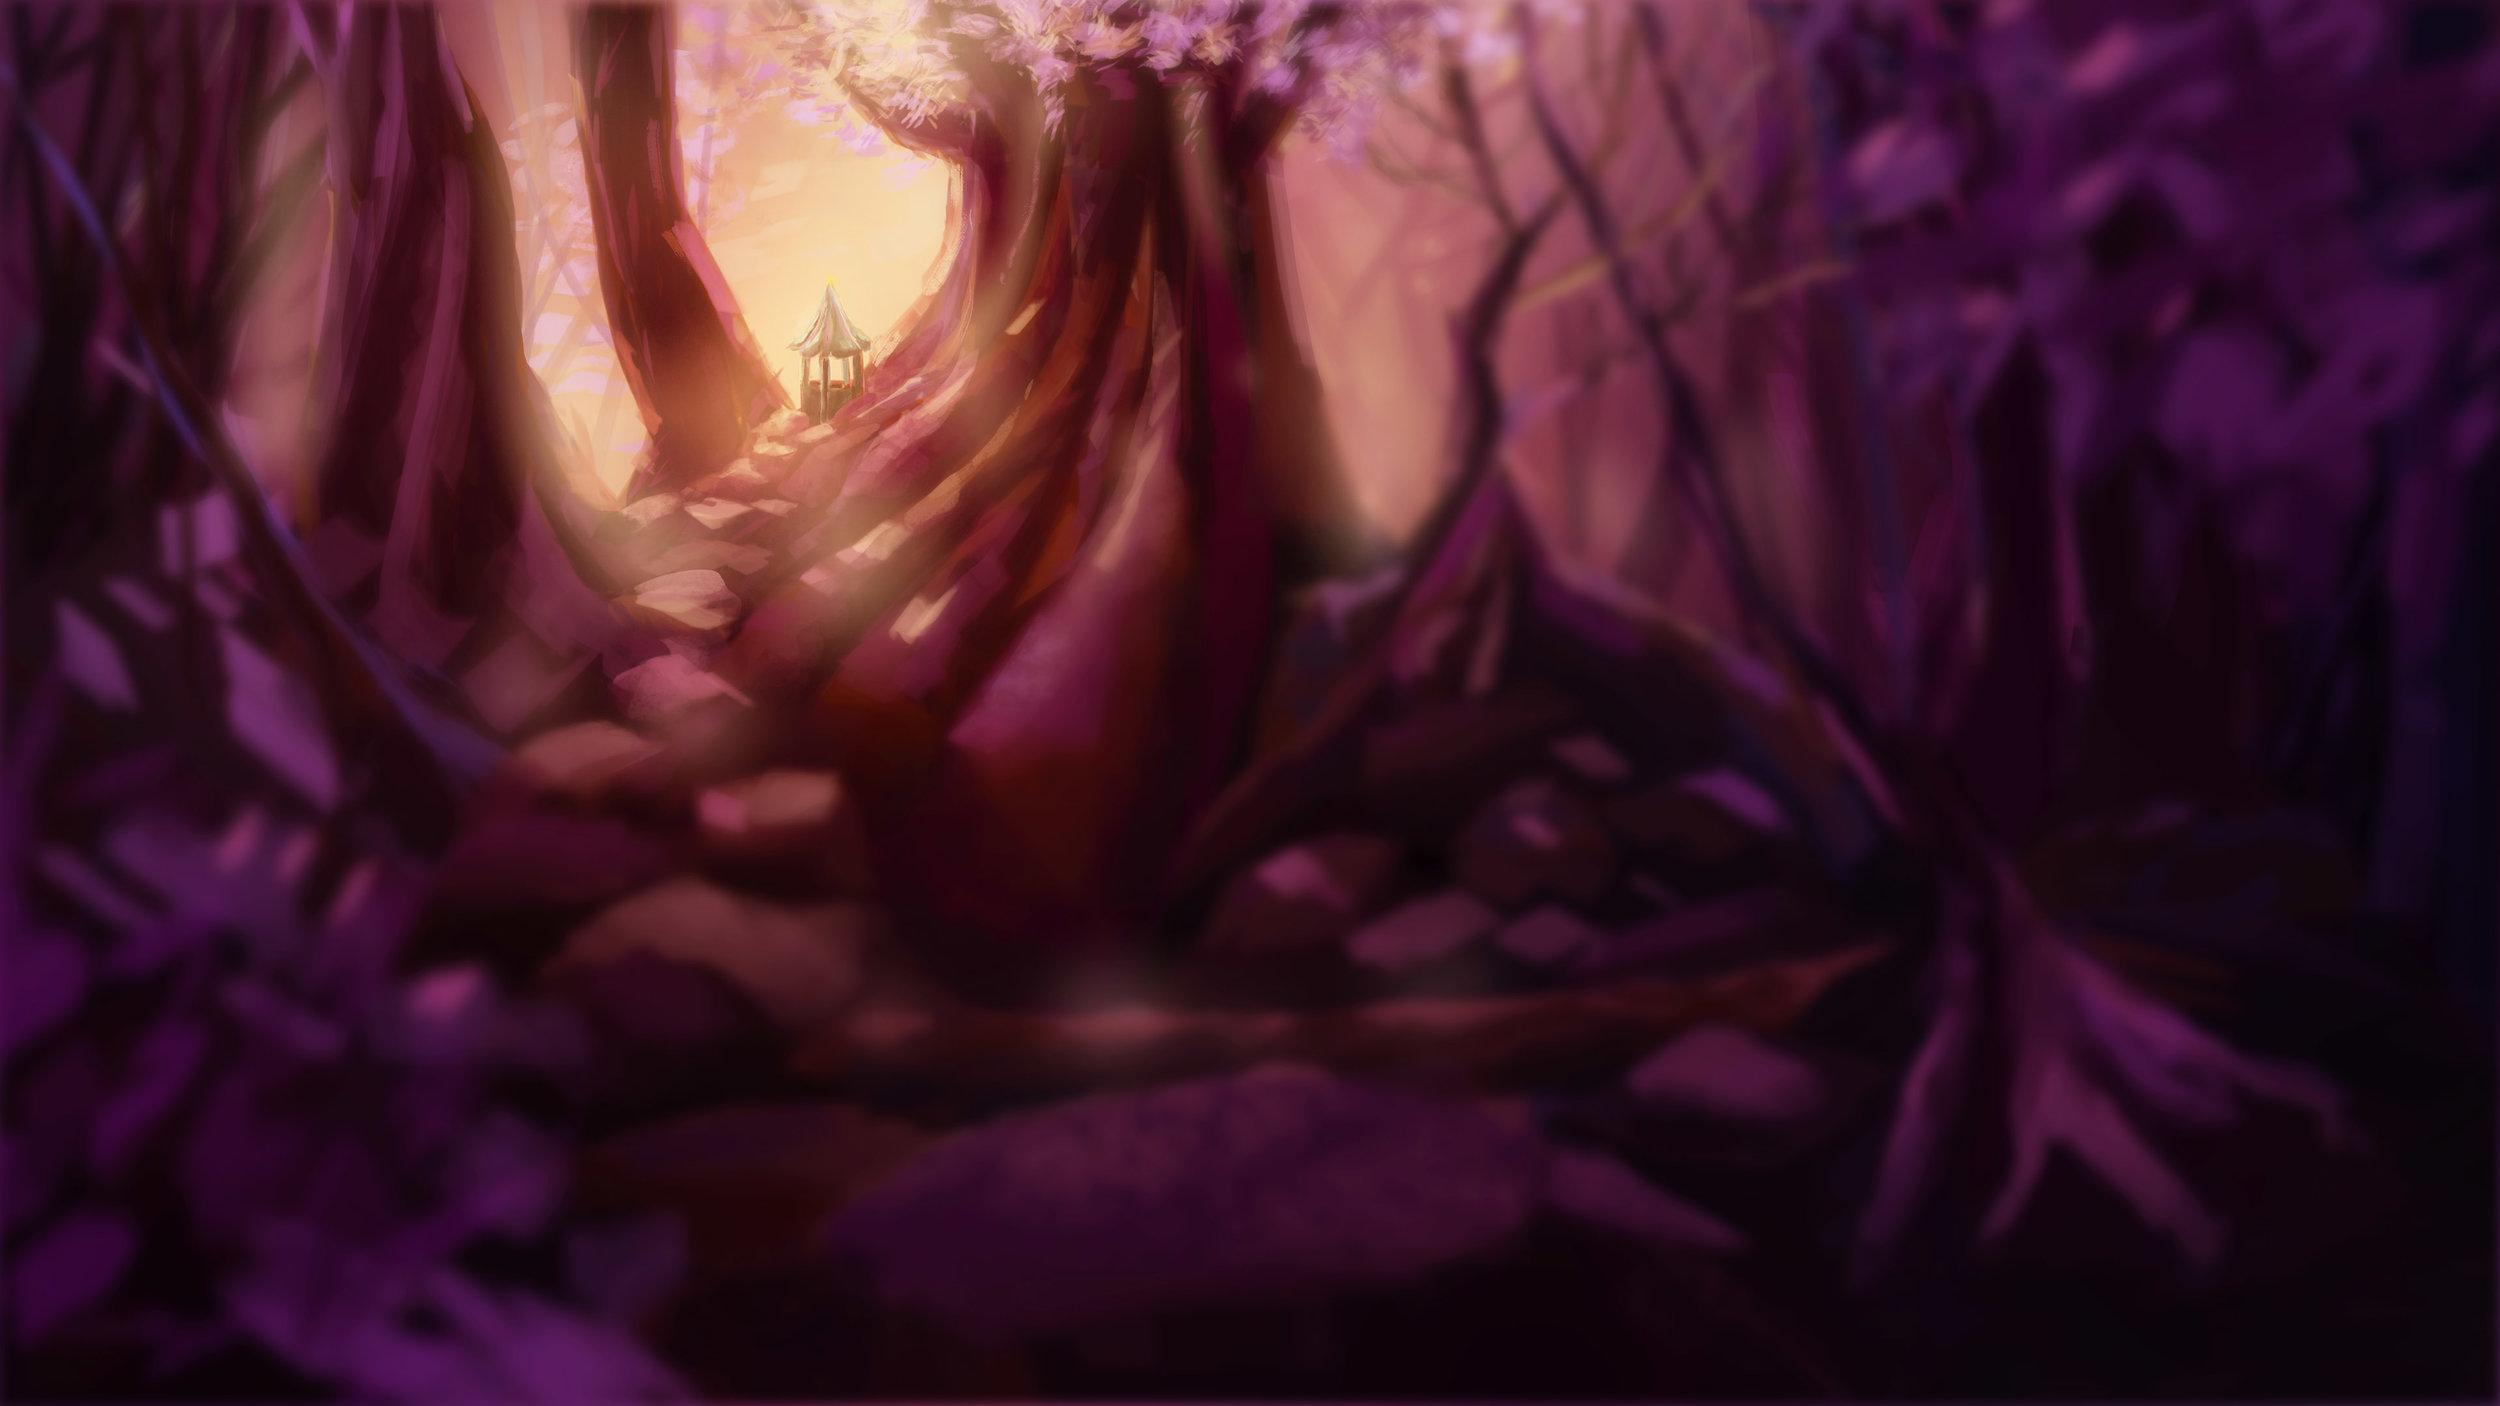 BA_FairyWorld_SarahVettori.jpg